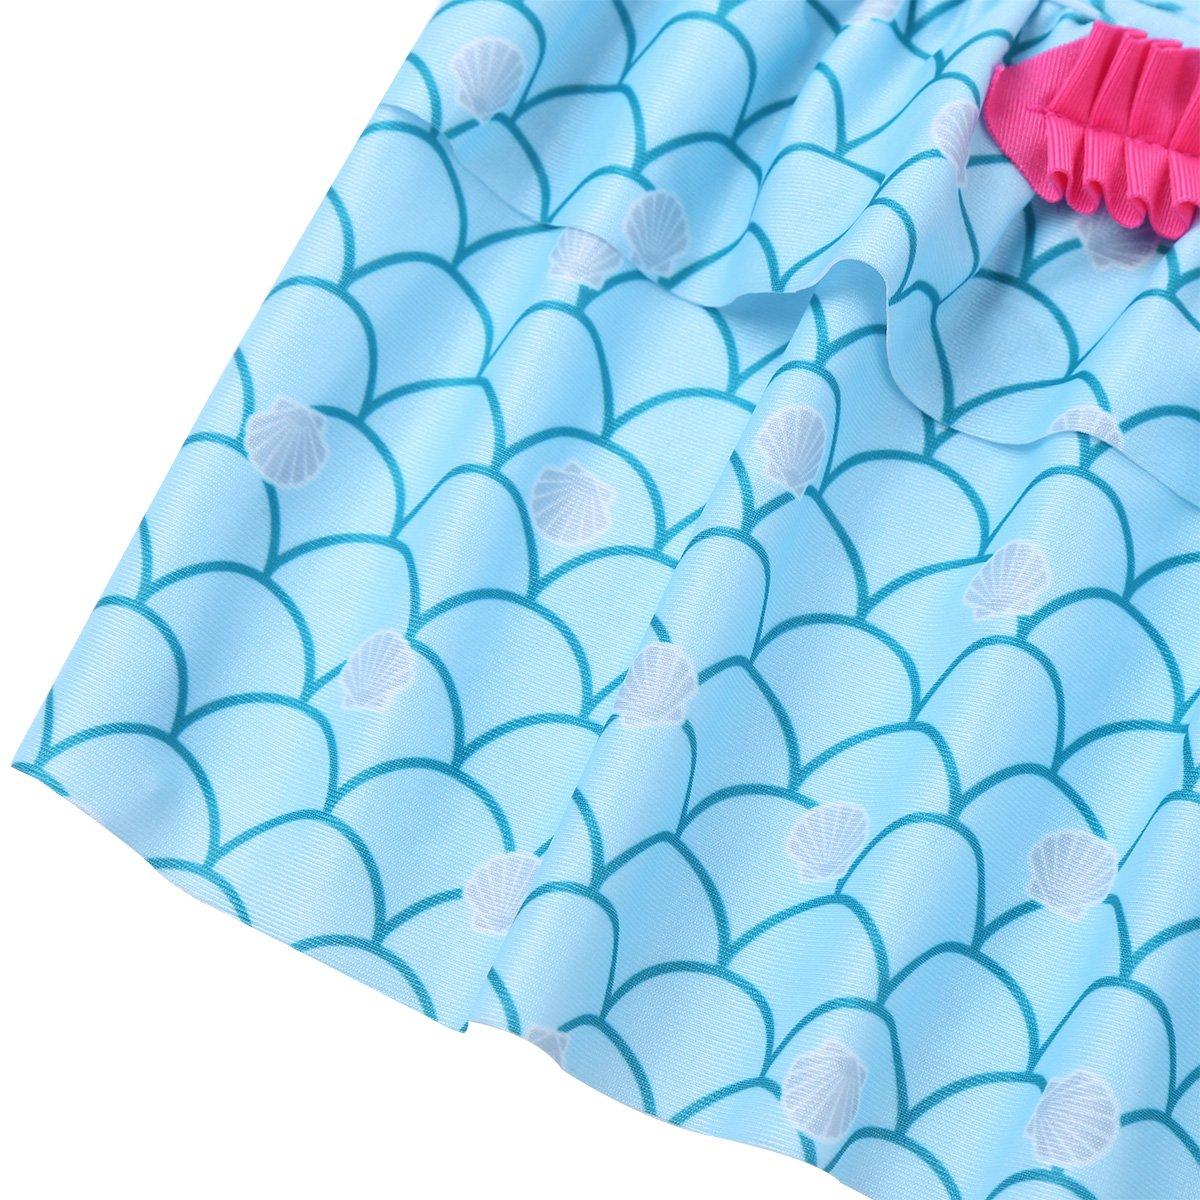 iEFiEL Kids Girls Halter Starfish Mermaid Ruffle Tankini Swimsuit Swimwear Tops with Bottoms Bathing Suit